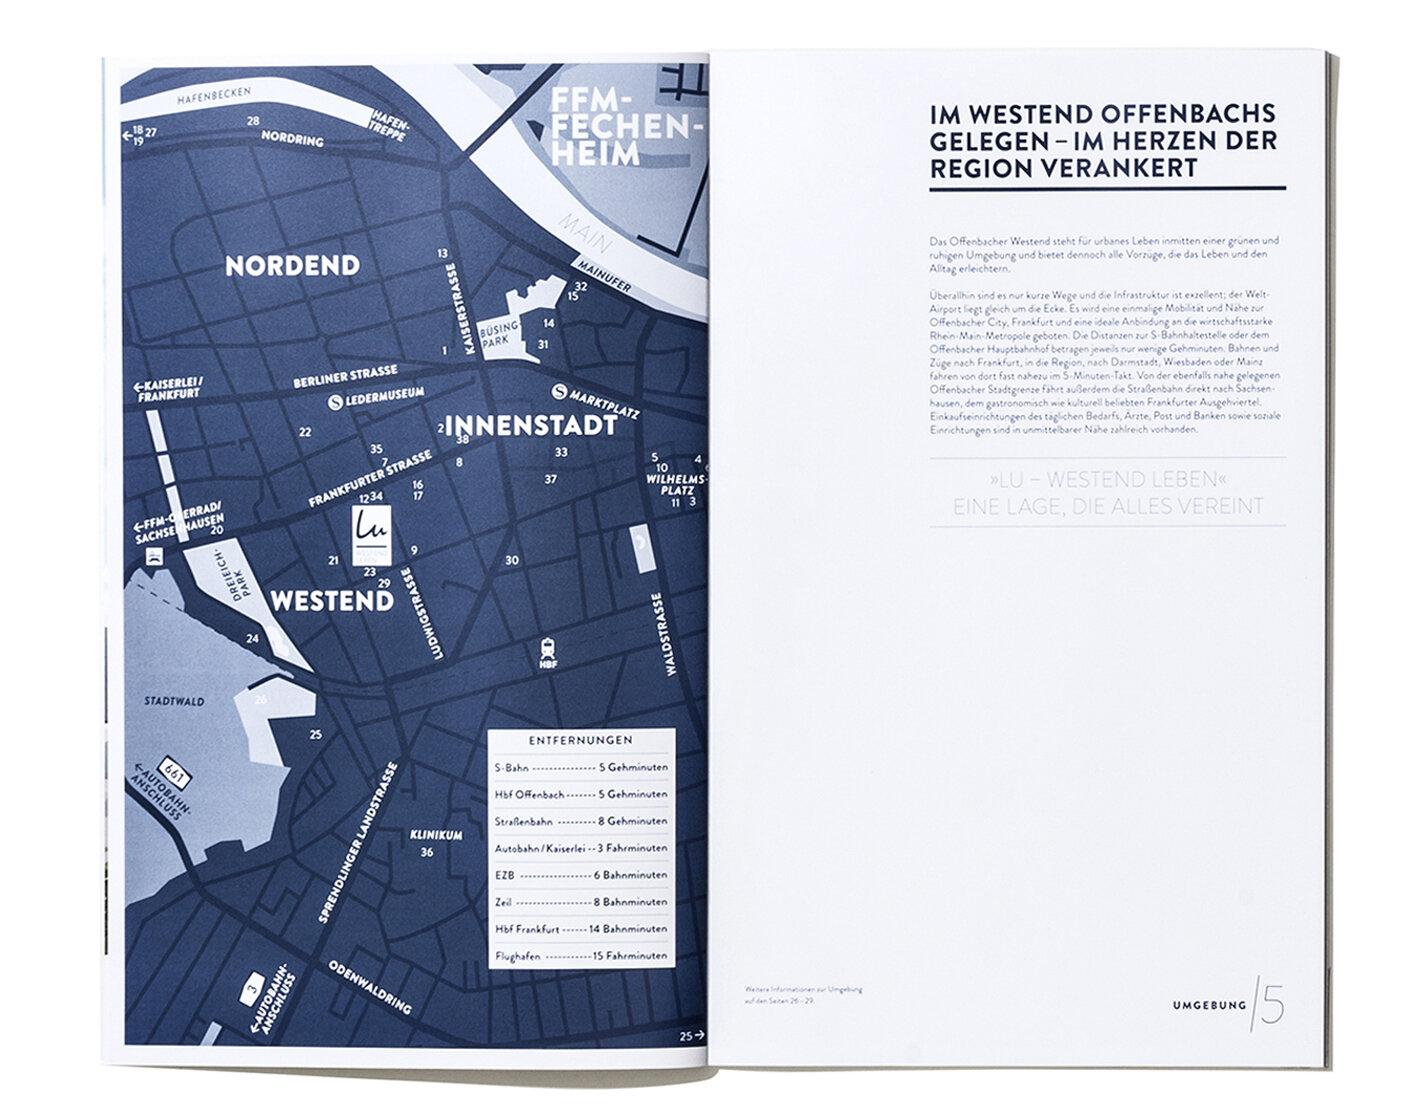 Lupp01-2.jpg